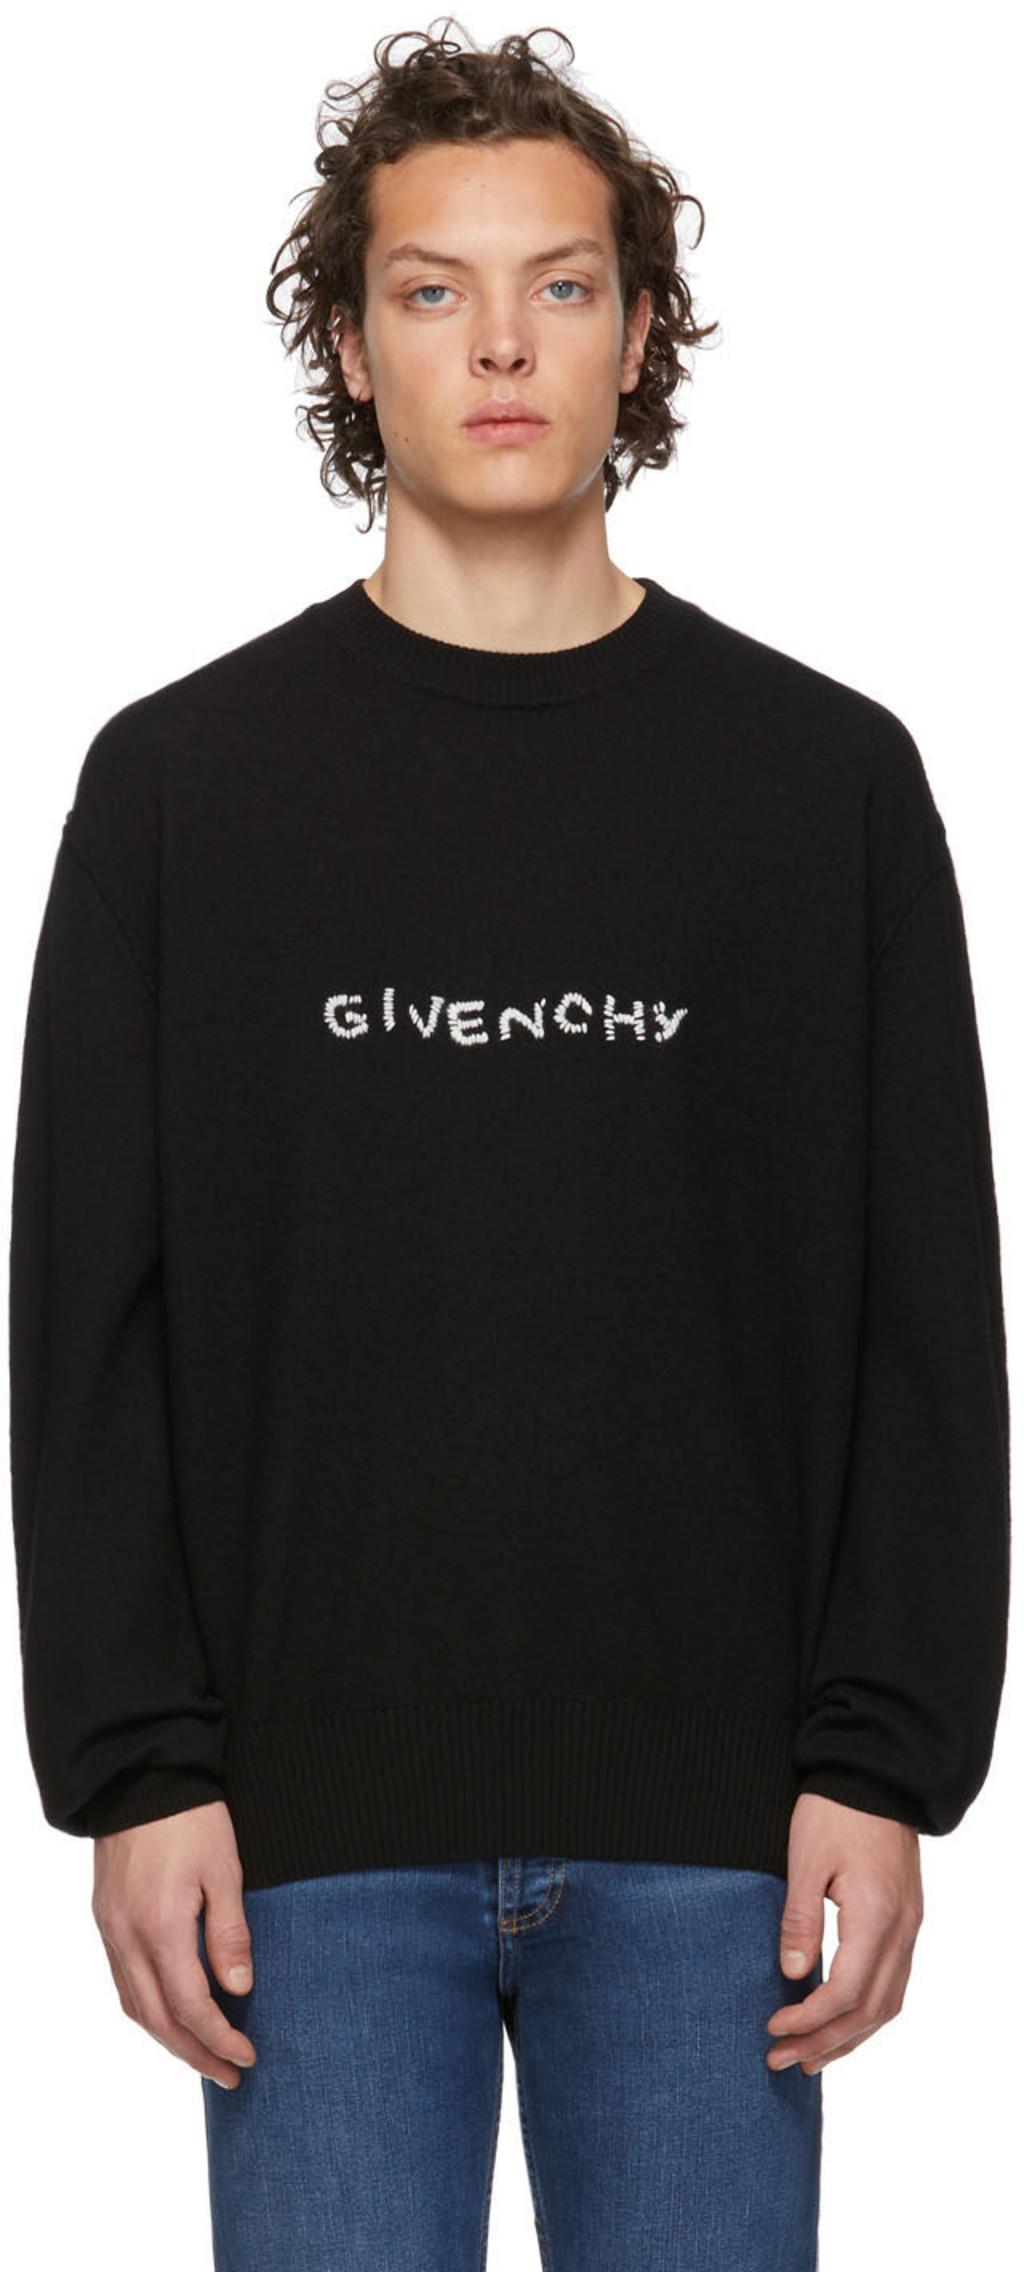 4da21e79b1 Givenchy Collection pour Hommes | SSENSE France